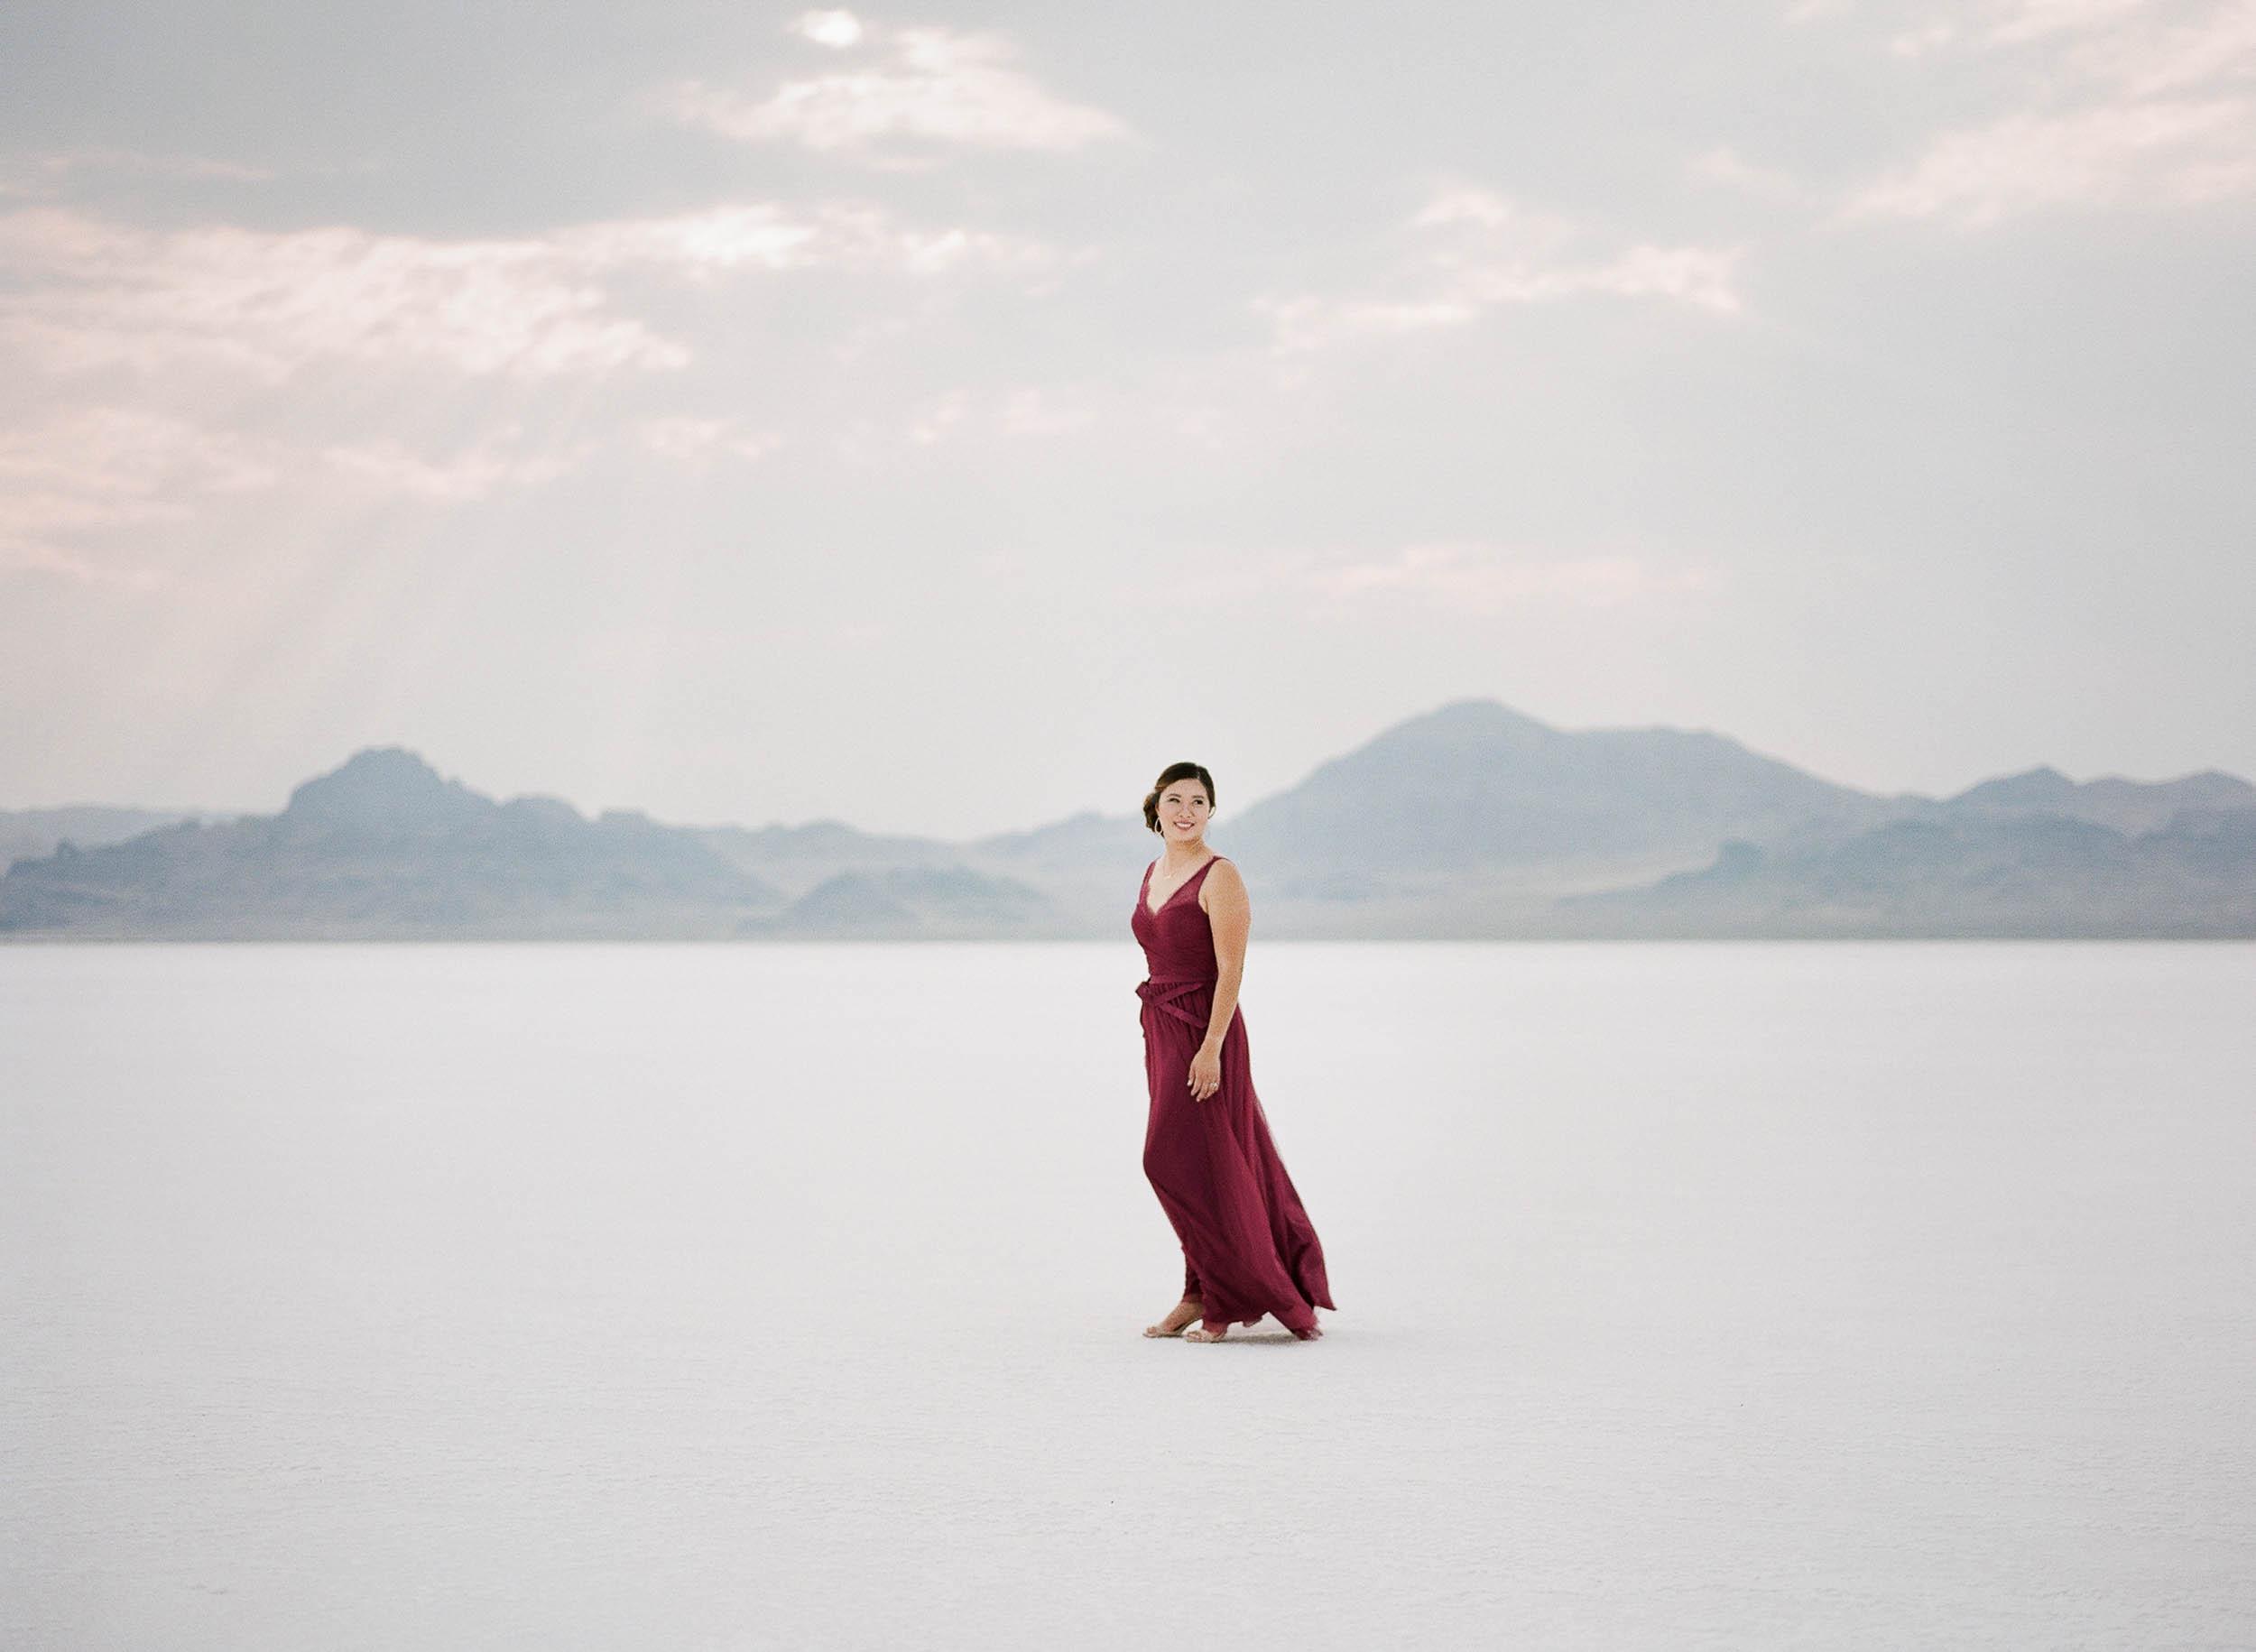 070918_Sandy A La Mode_Family_Utah Salt Flats_Buena Lane Photography_F400_31.jpg